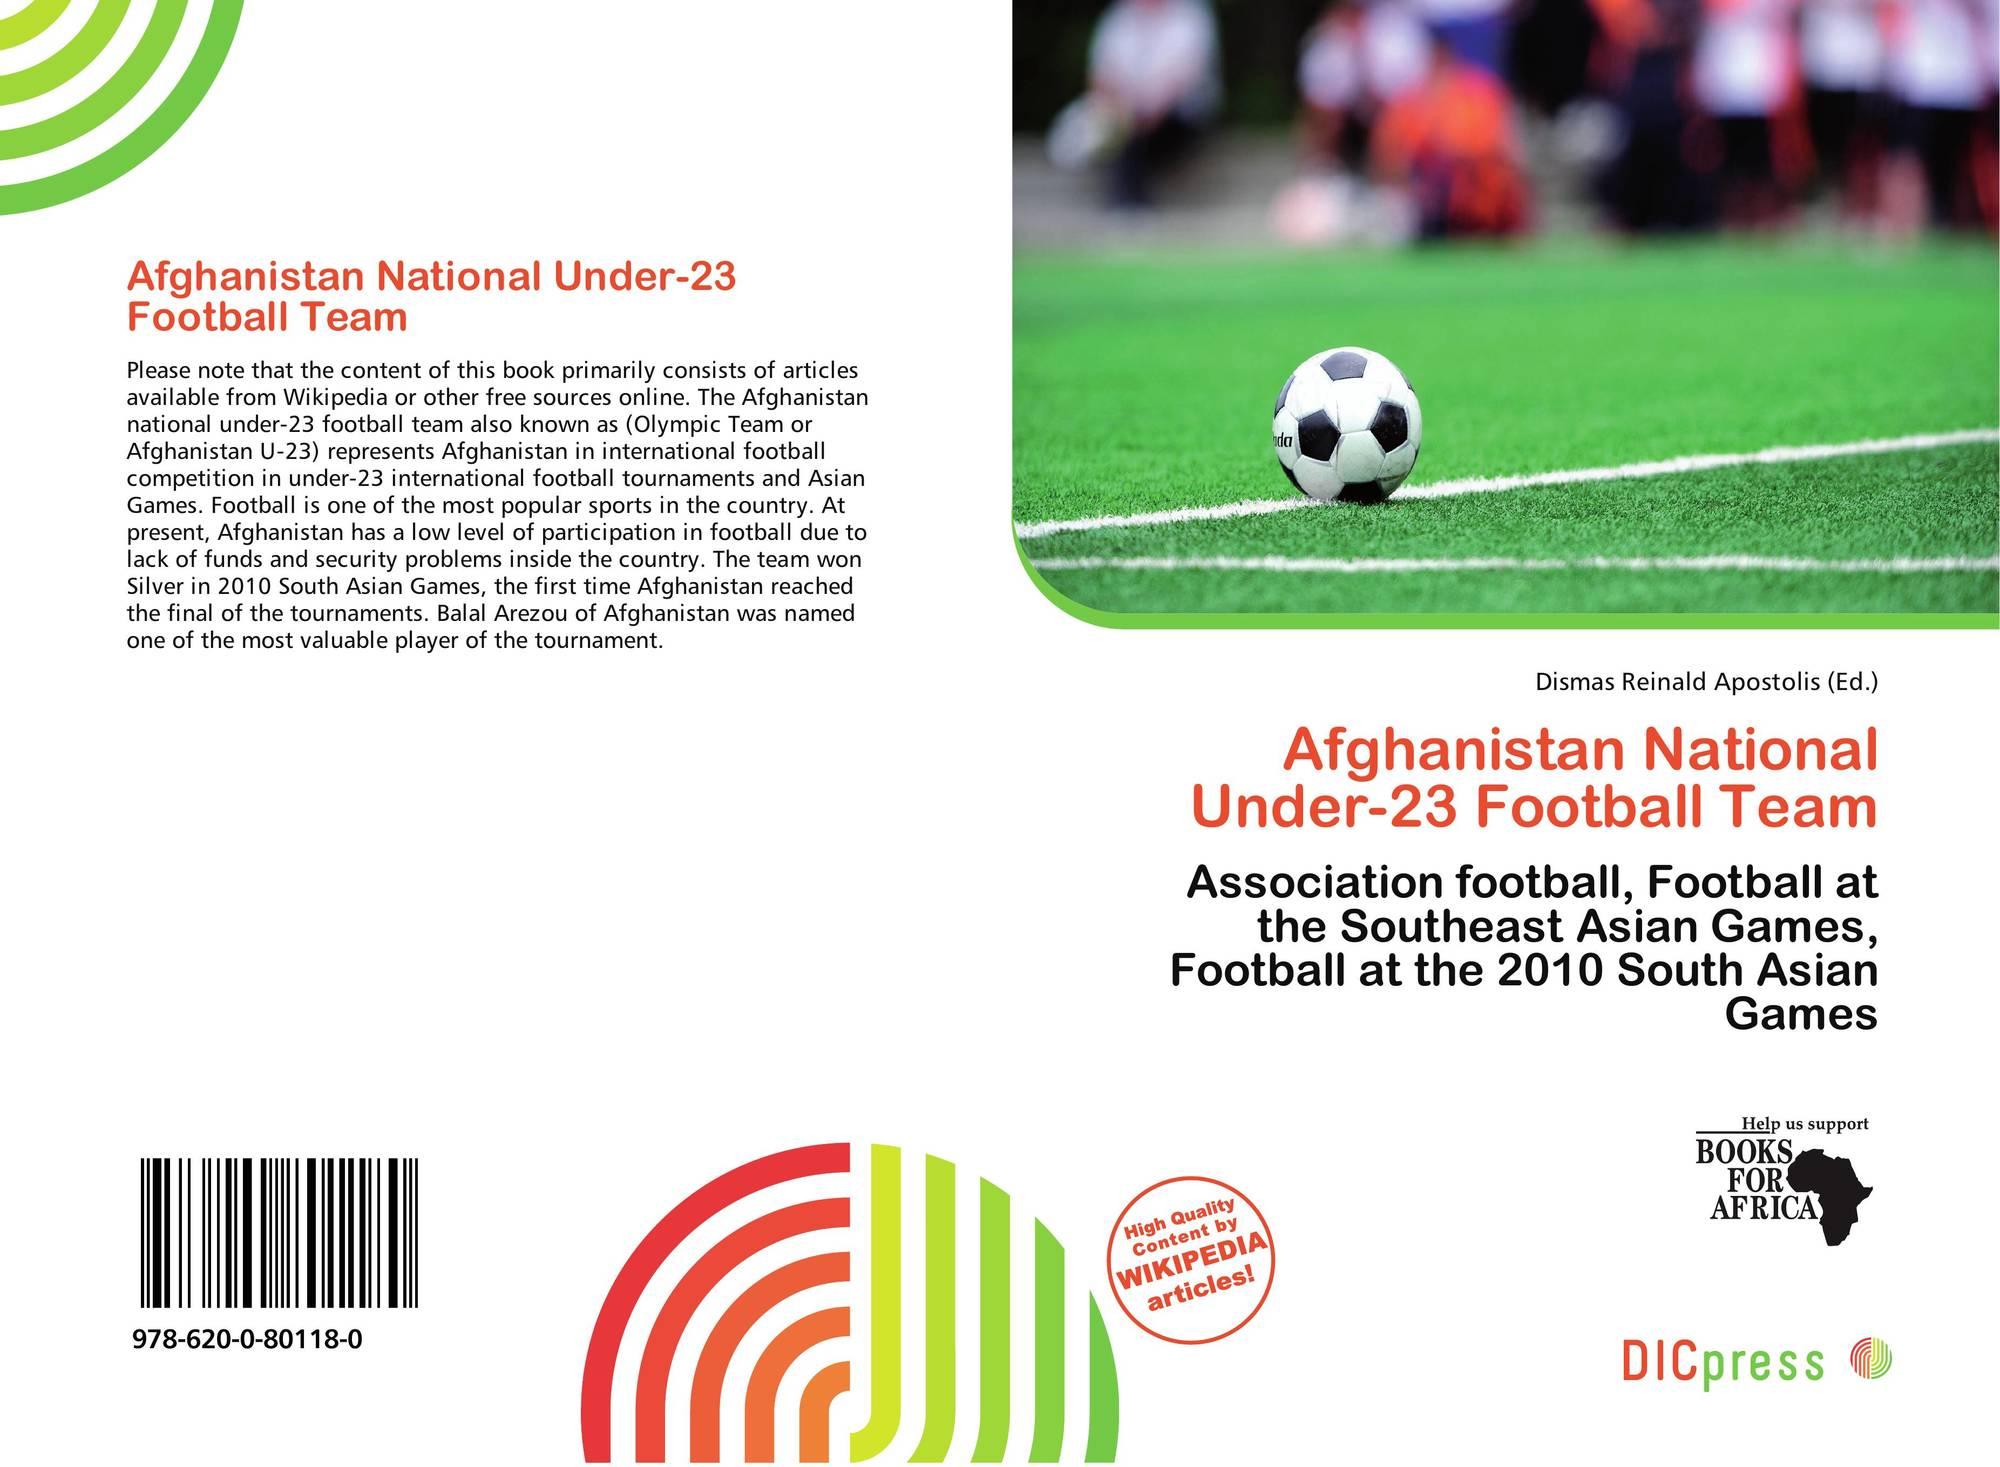 Afghanistan national under-23 football team